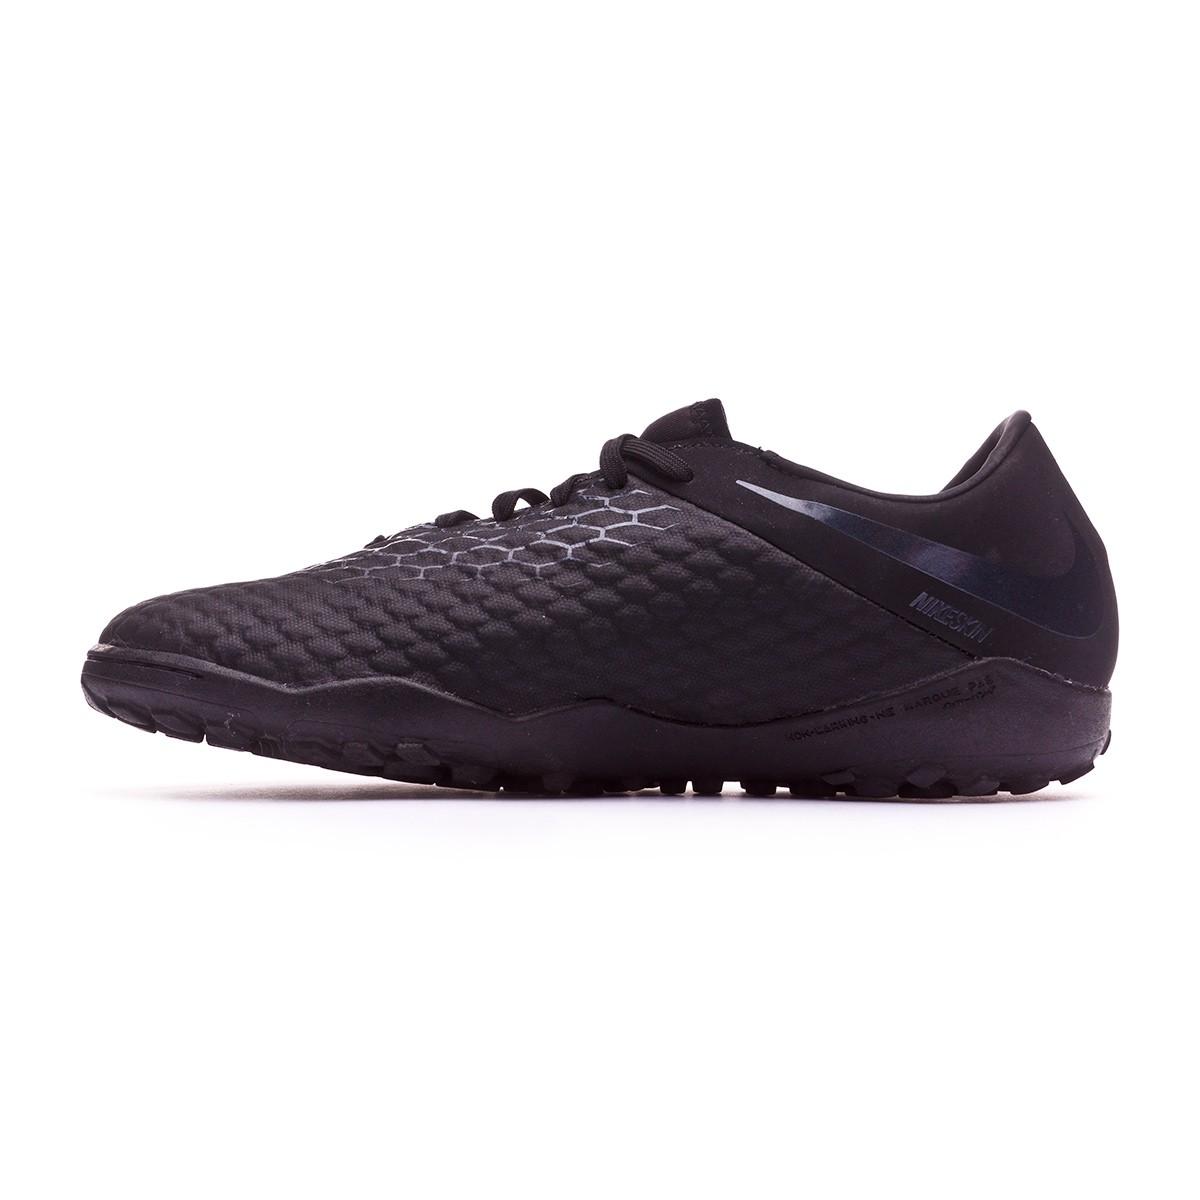 2a60b33de15a Football Boot Nike Hypervenom Phantom III Academy Turf Black - Tienda de  fútbol Fútbol Emotion